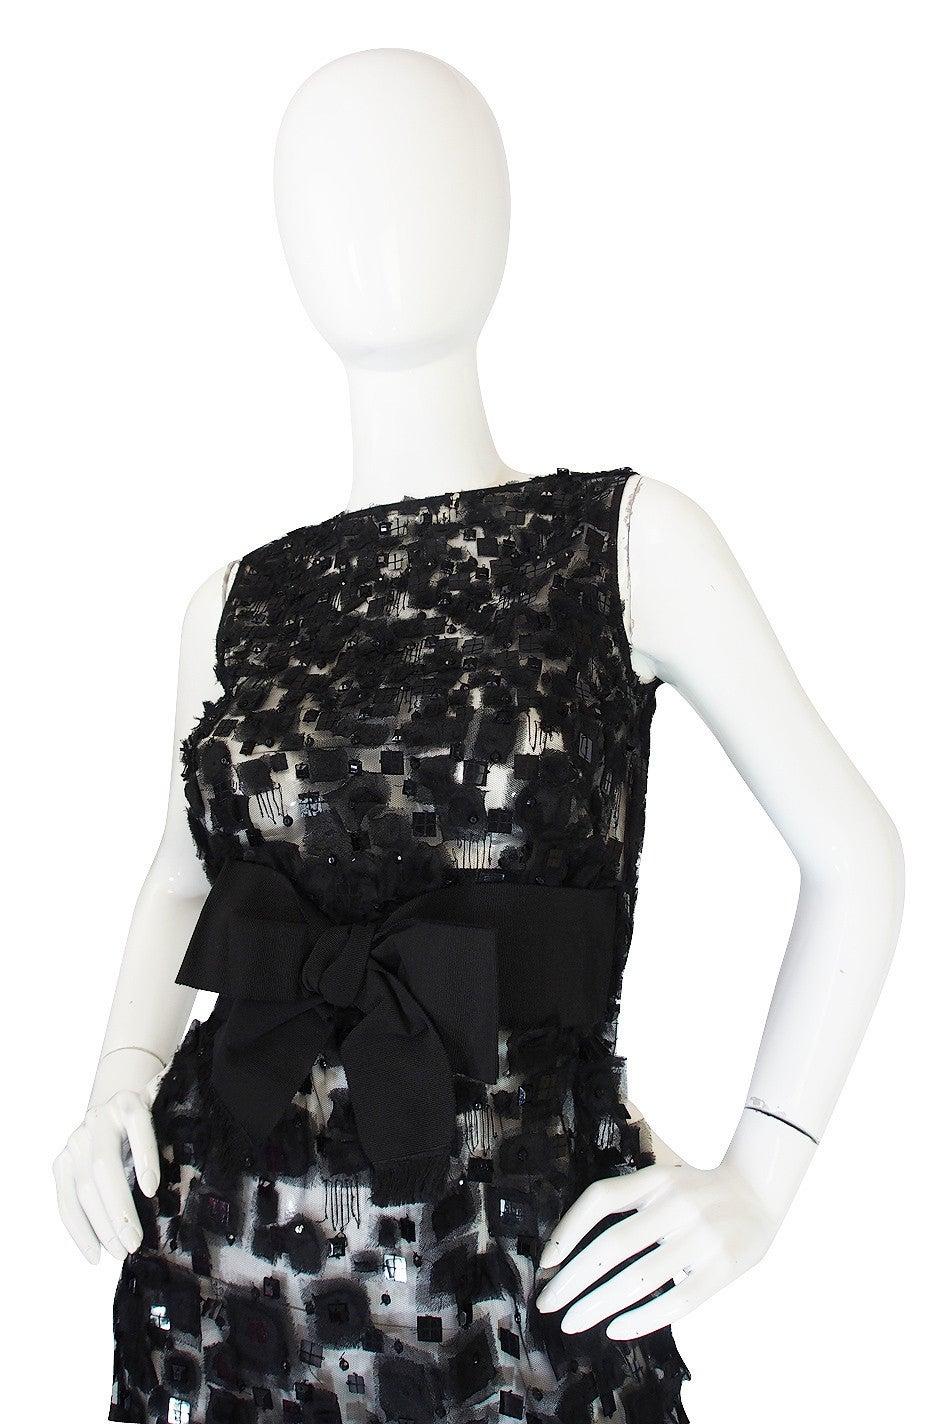 2009 Resort Lace Watteau Oscar De La Renta Dress In Excellent Condition For Sale In Toronto, ON